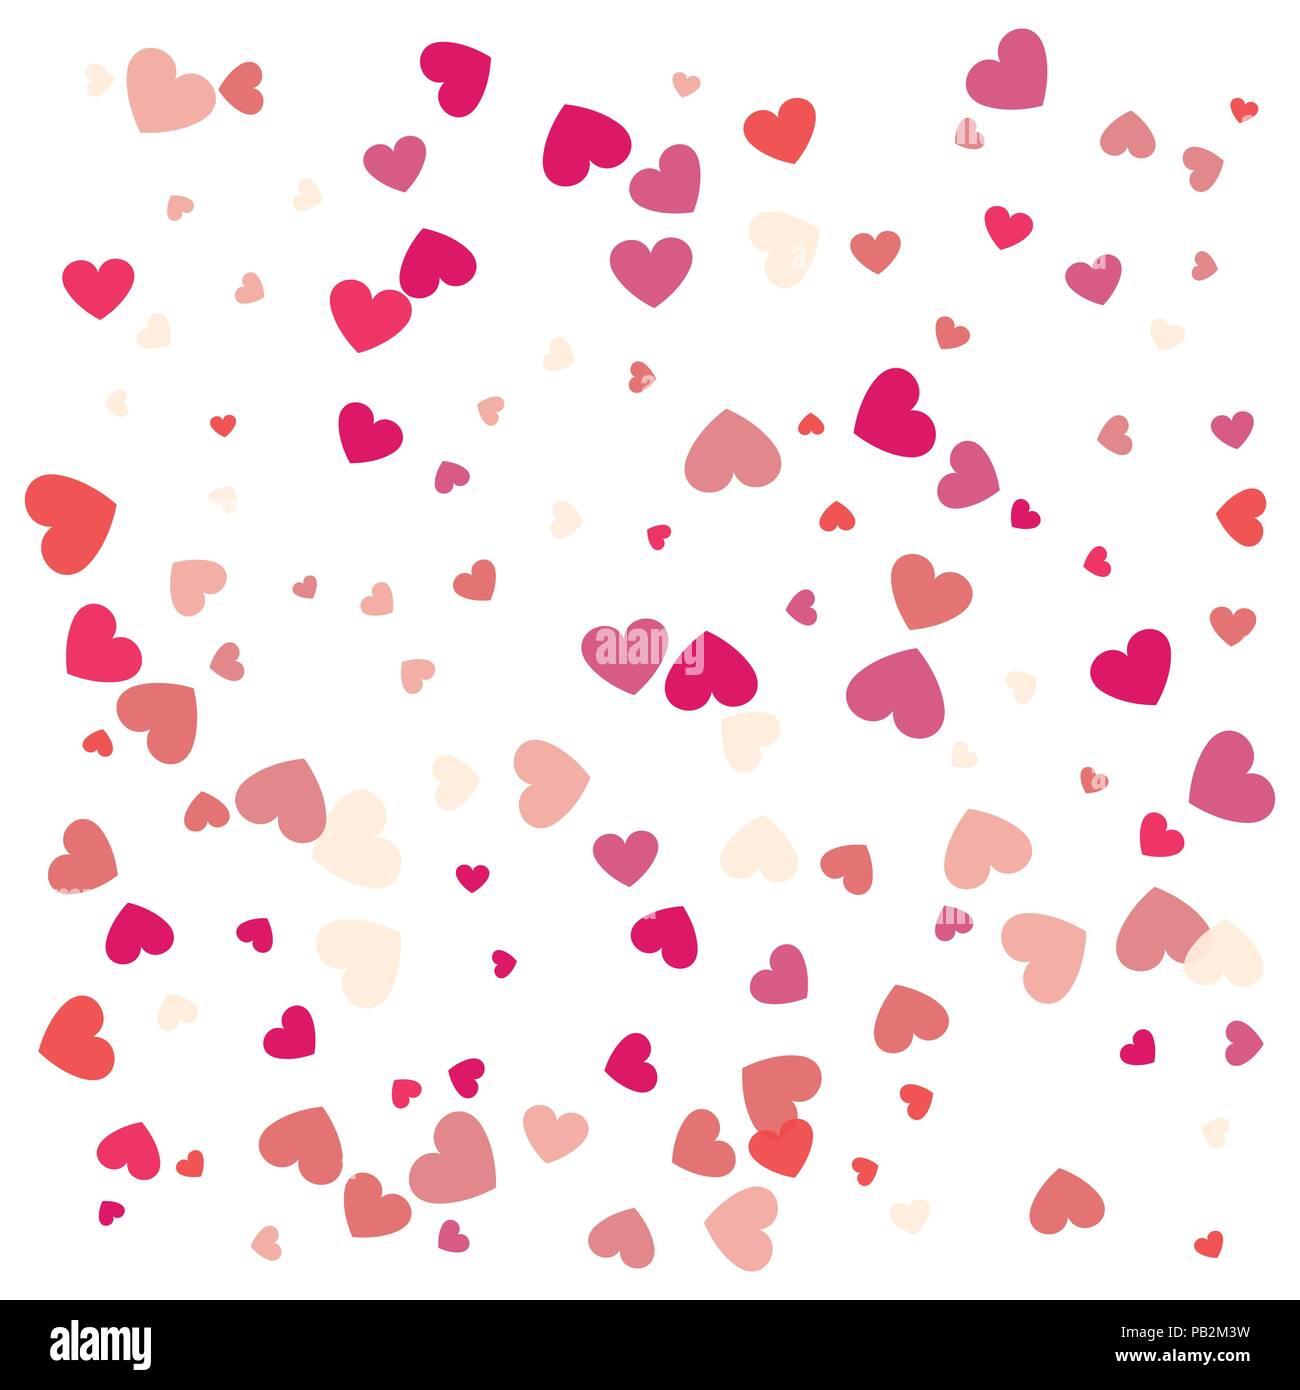 Beautiful Confetti Hearts Falling On Background Invitation Template